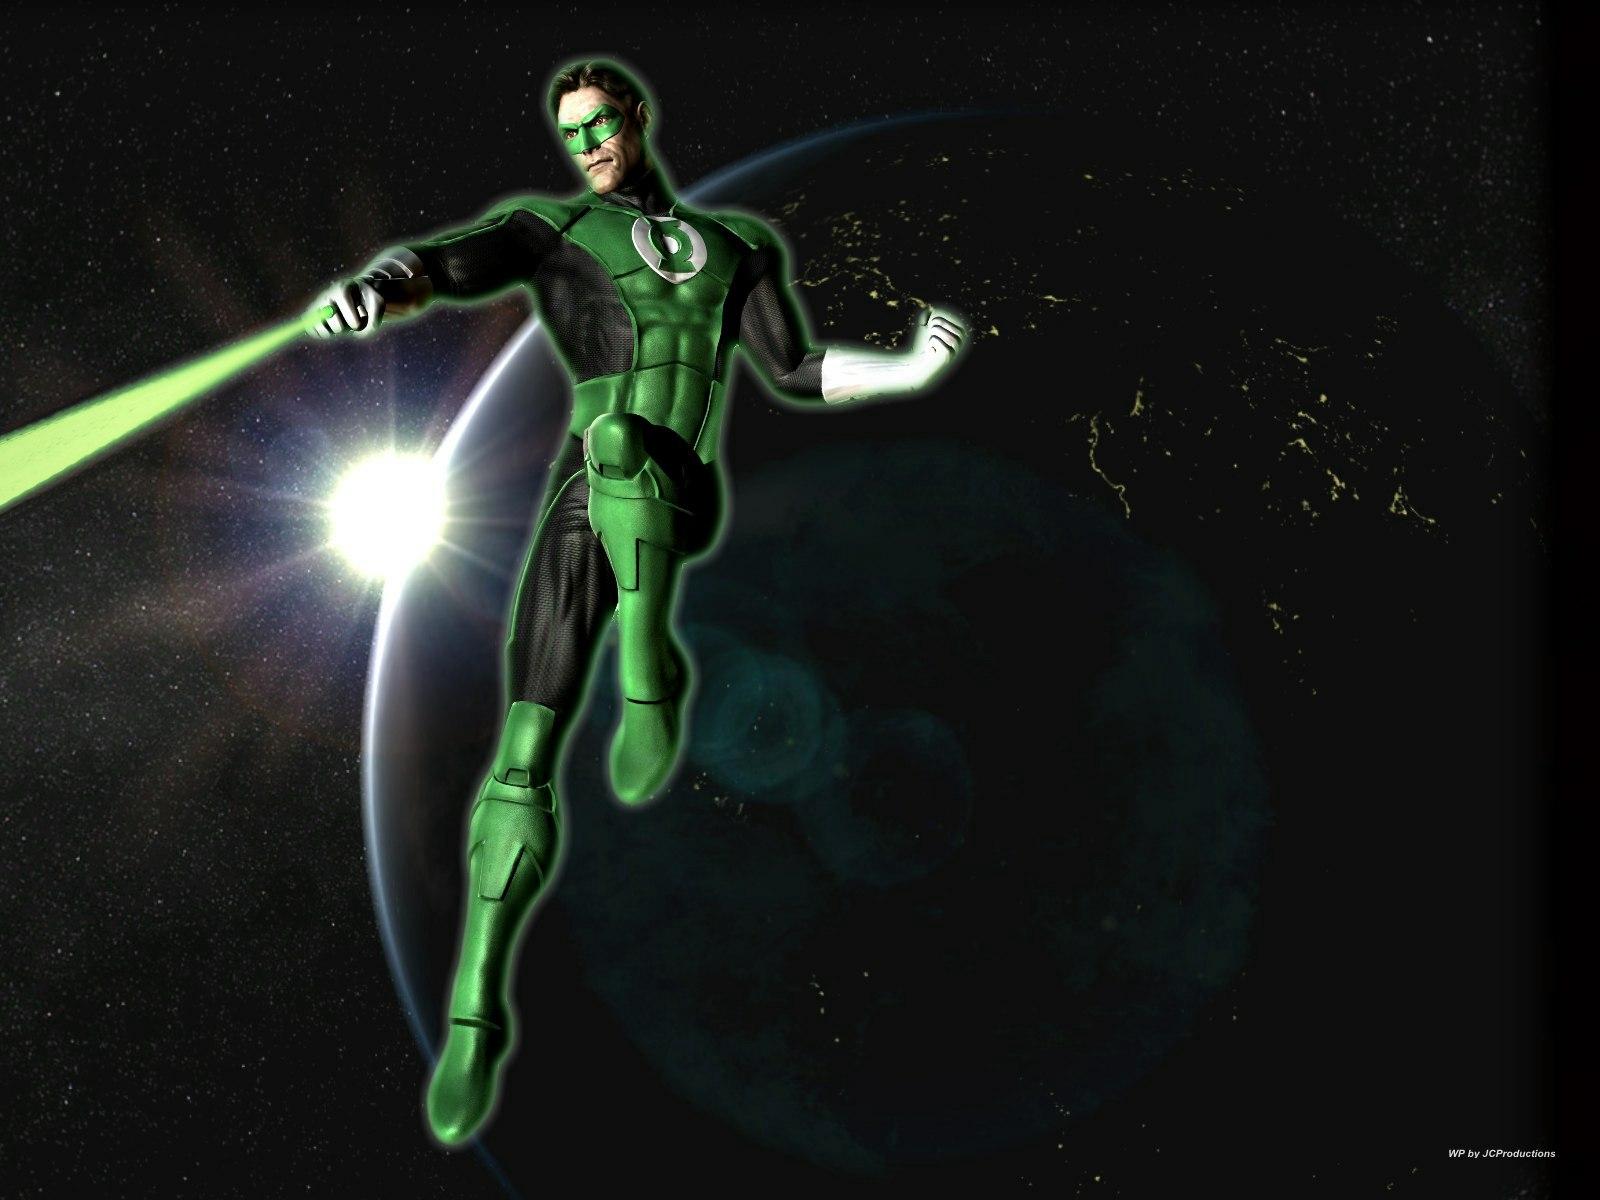 Green Lantern Comic Wallpaper: DC Comics Images Green Lantern In Space HD Wallpaper And